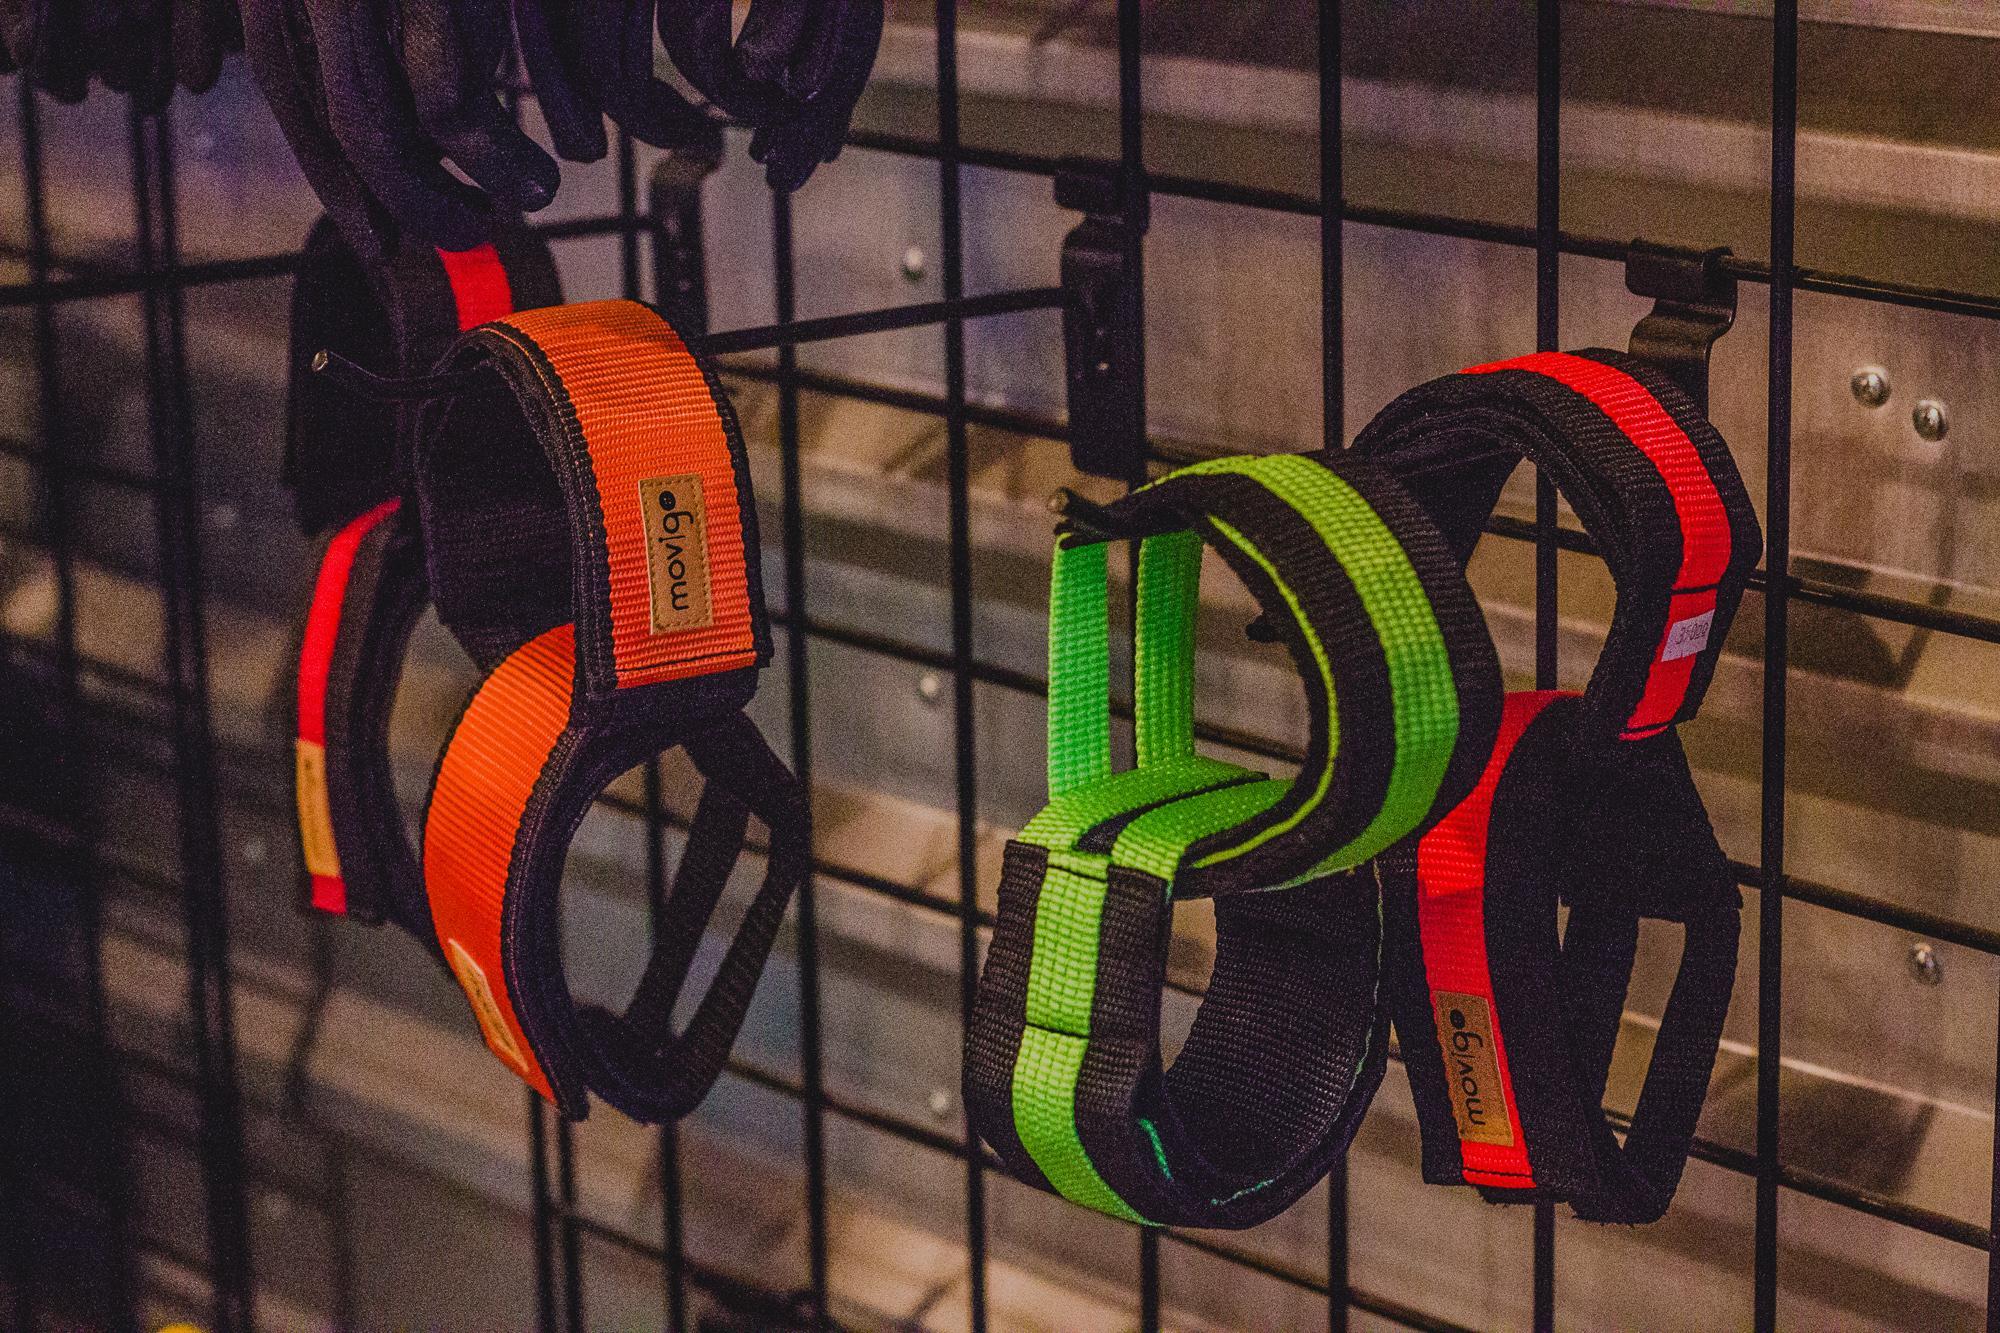 17. Movigo_s pedal straps on sale at The Ride Co_